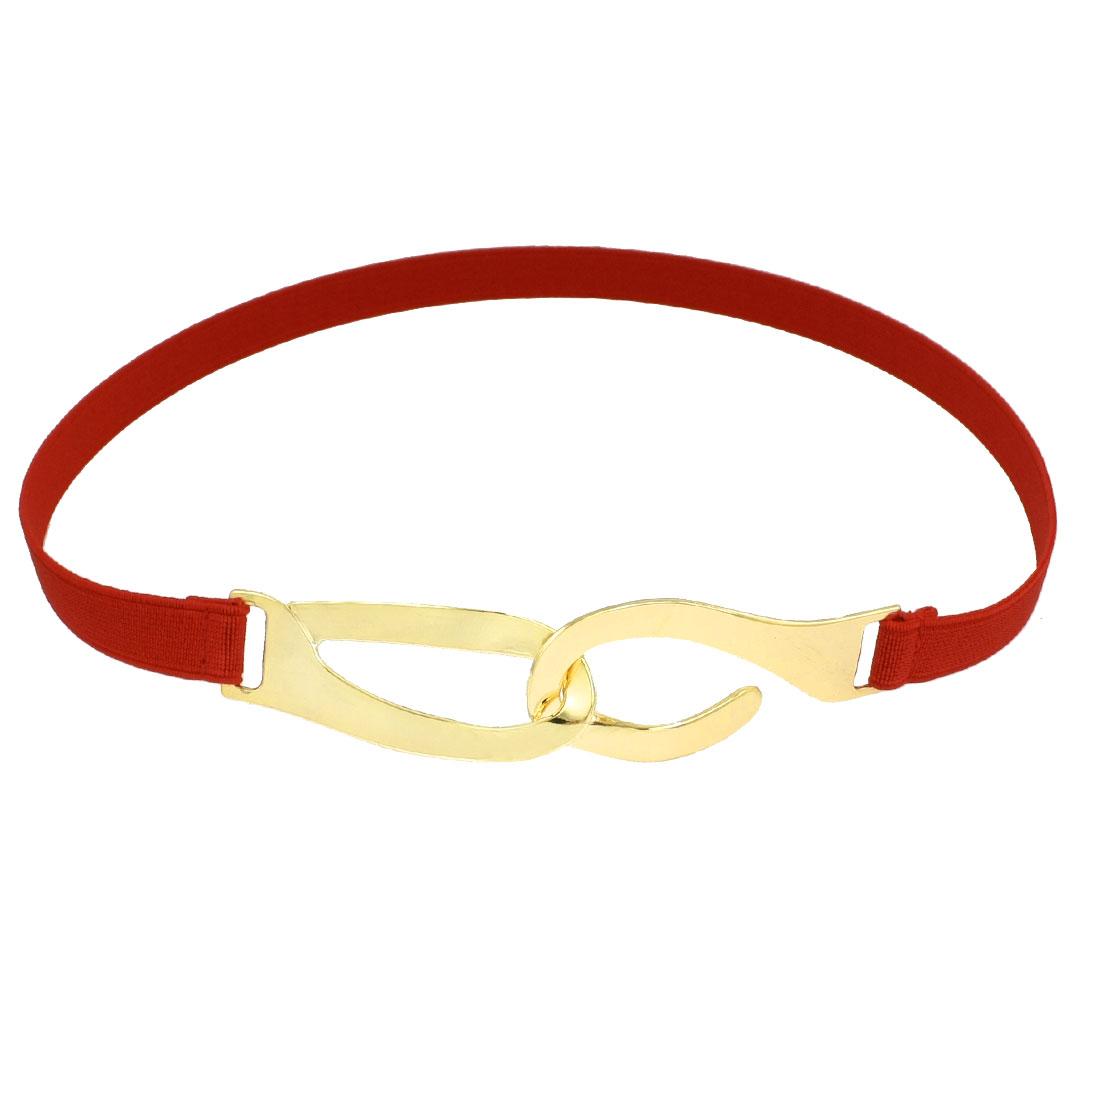 Gold Tone Interlocking Closure Elastic High Waistband Slim Waist Belt Red for Woman